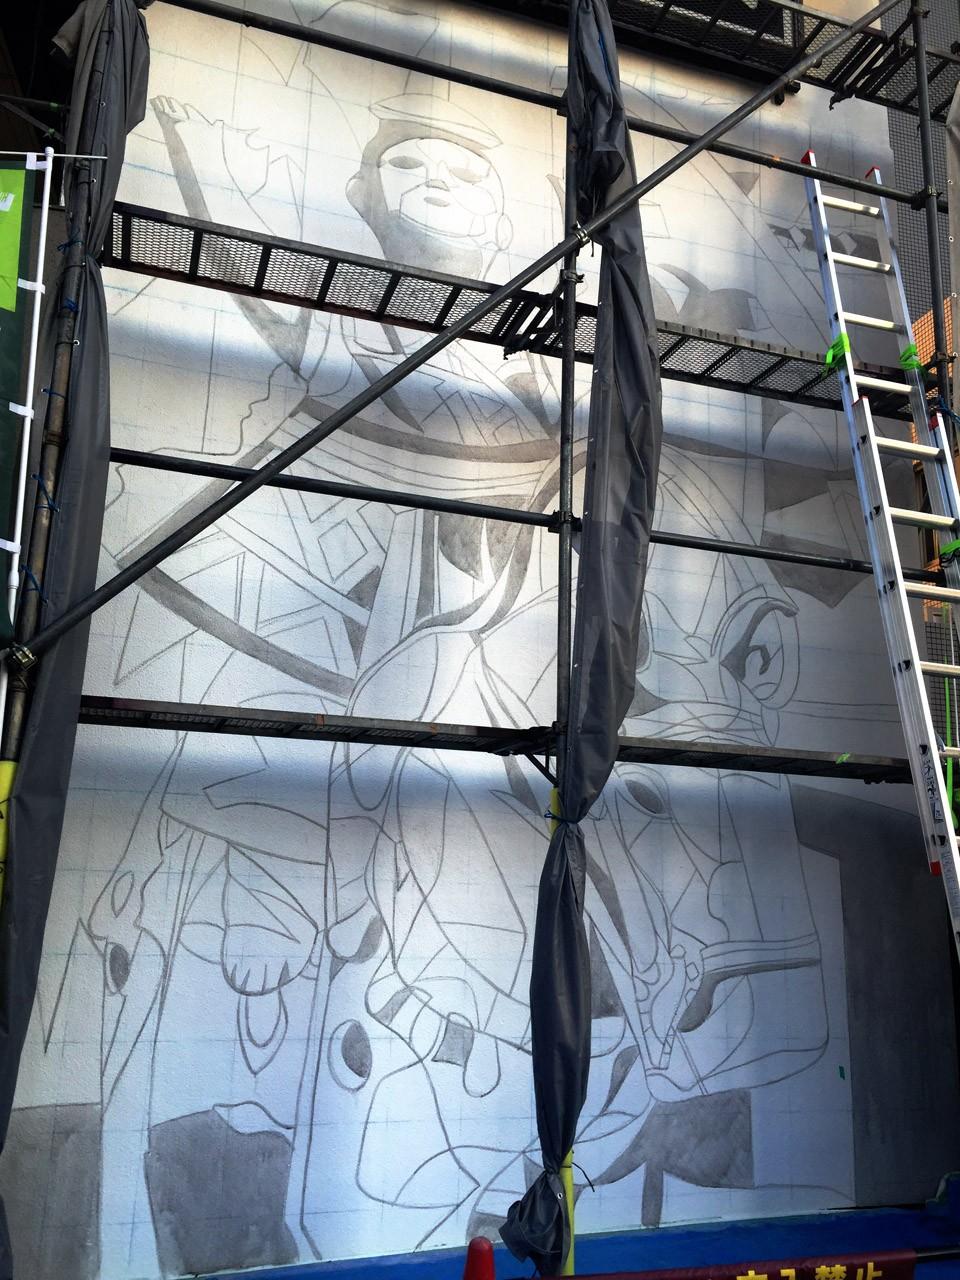 1280-outline-DAAS_takatsuki-haniwa-mural-3